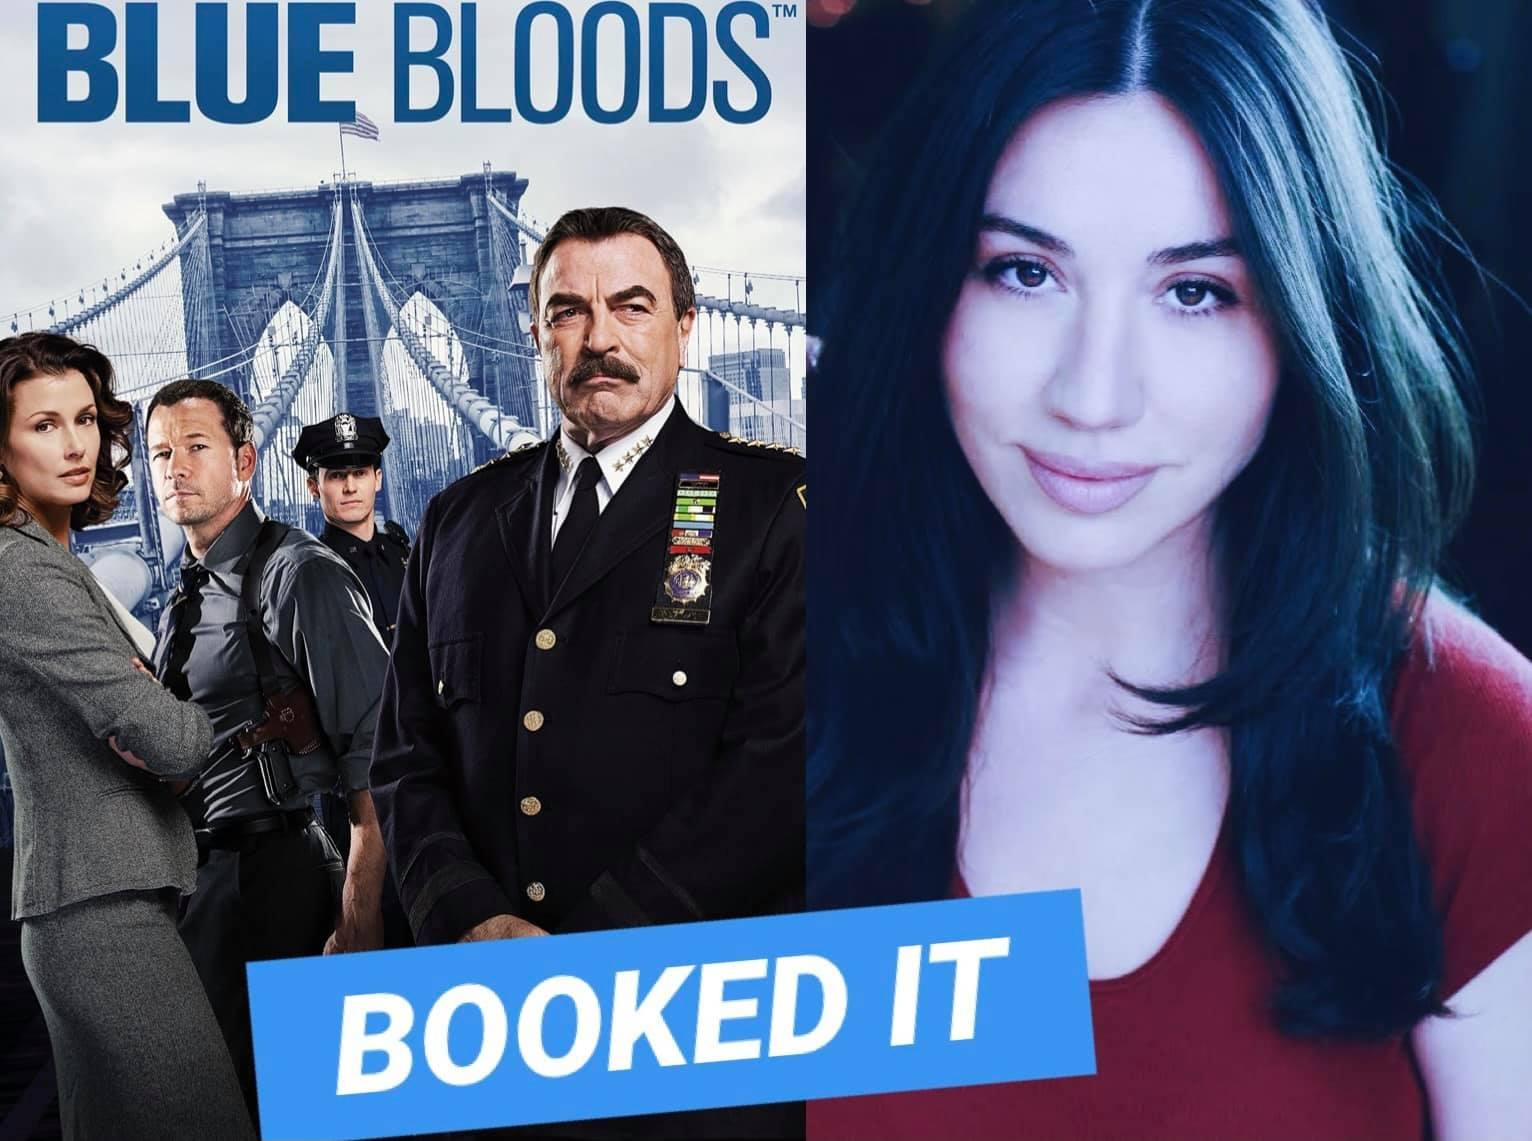 Julie Asriyan booked Blue Bloods